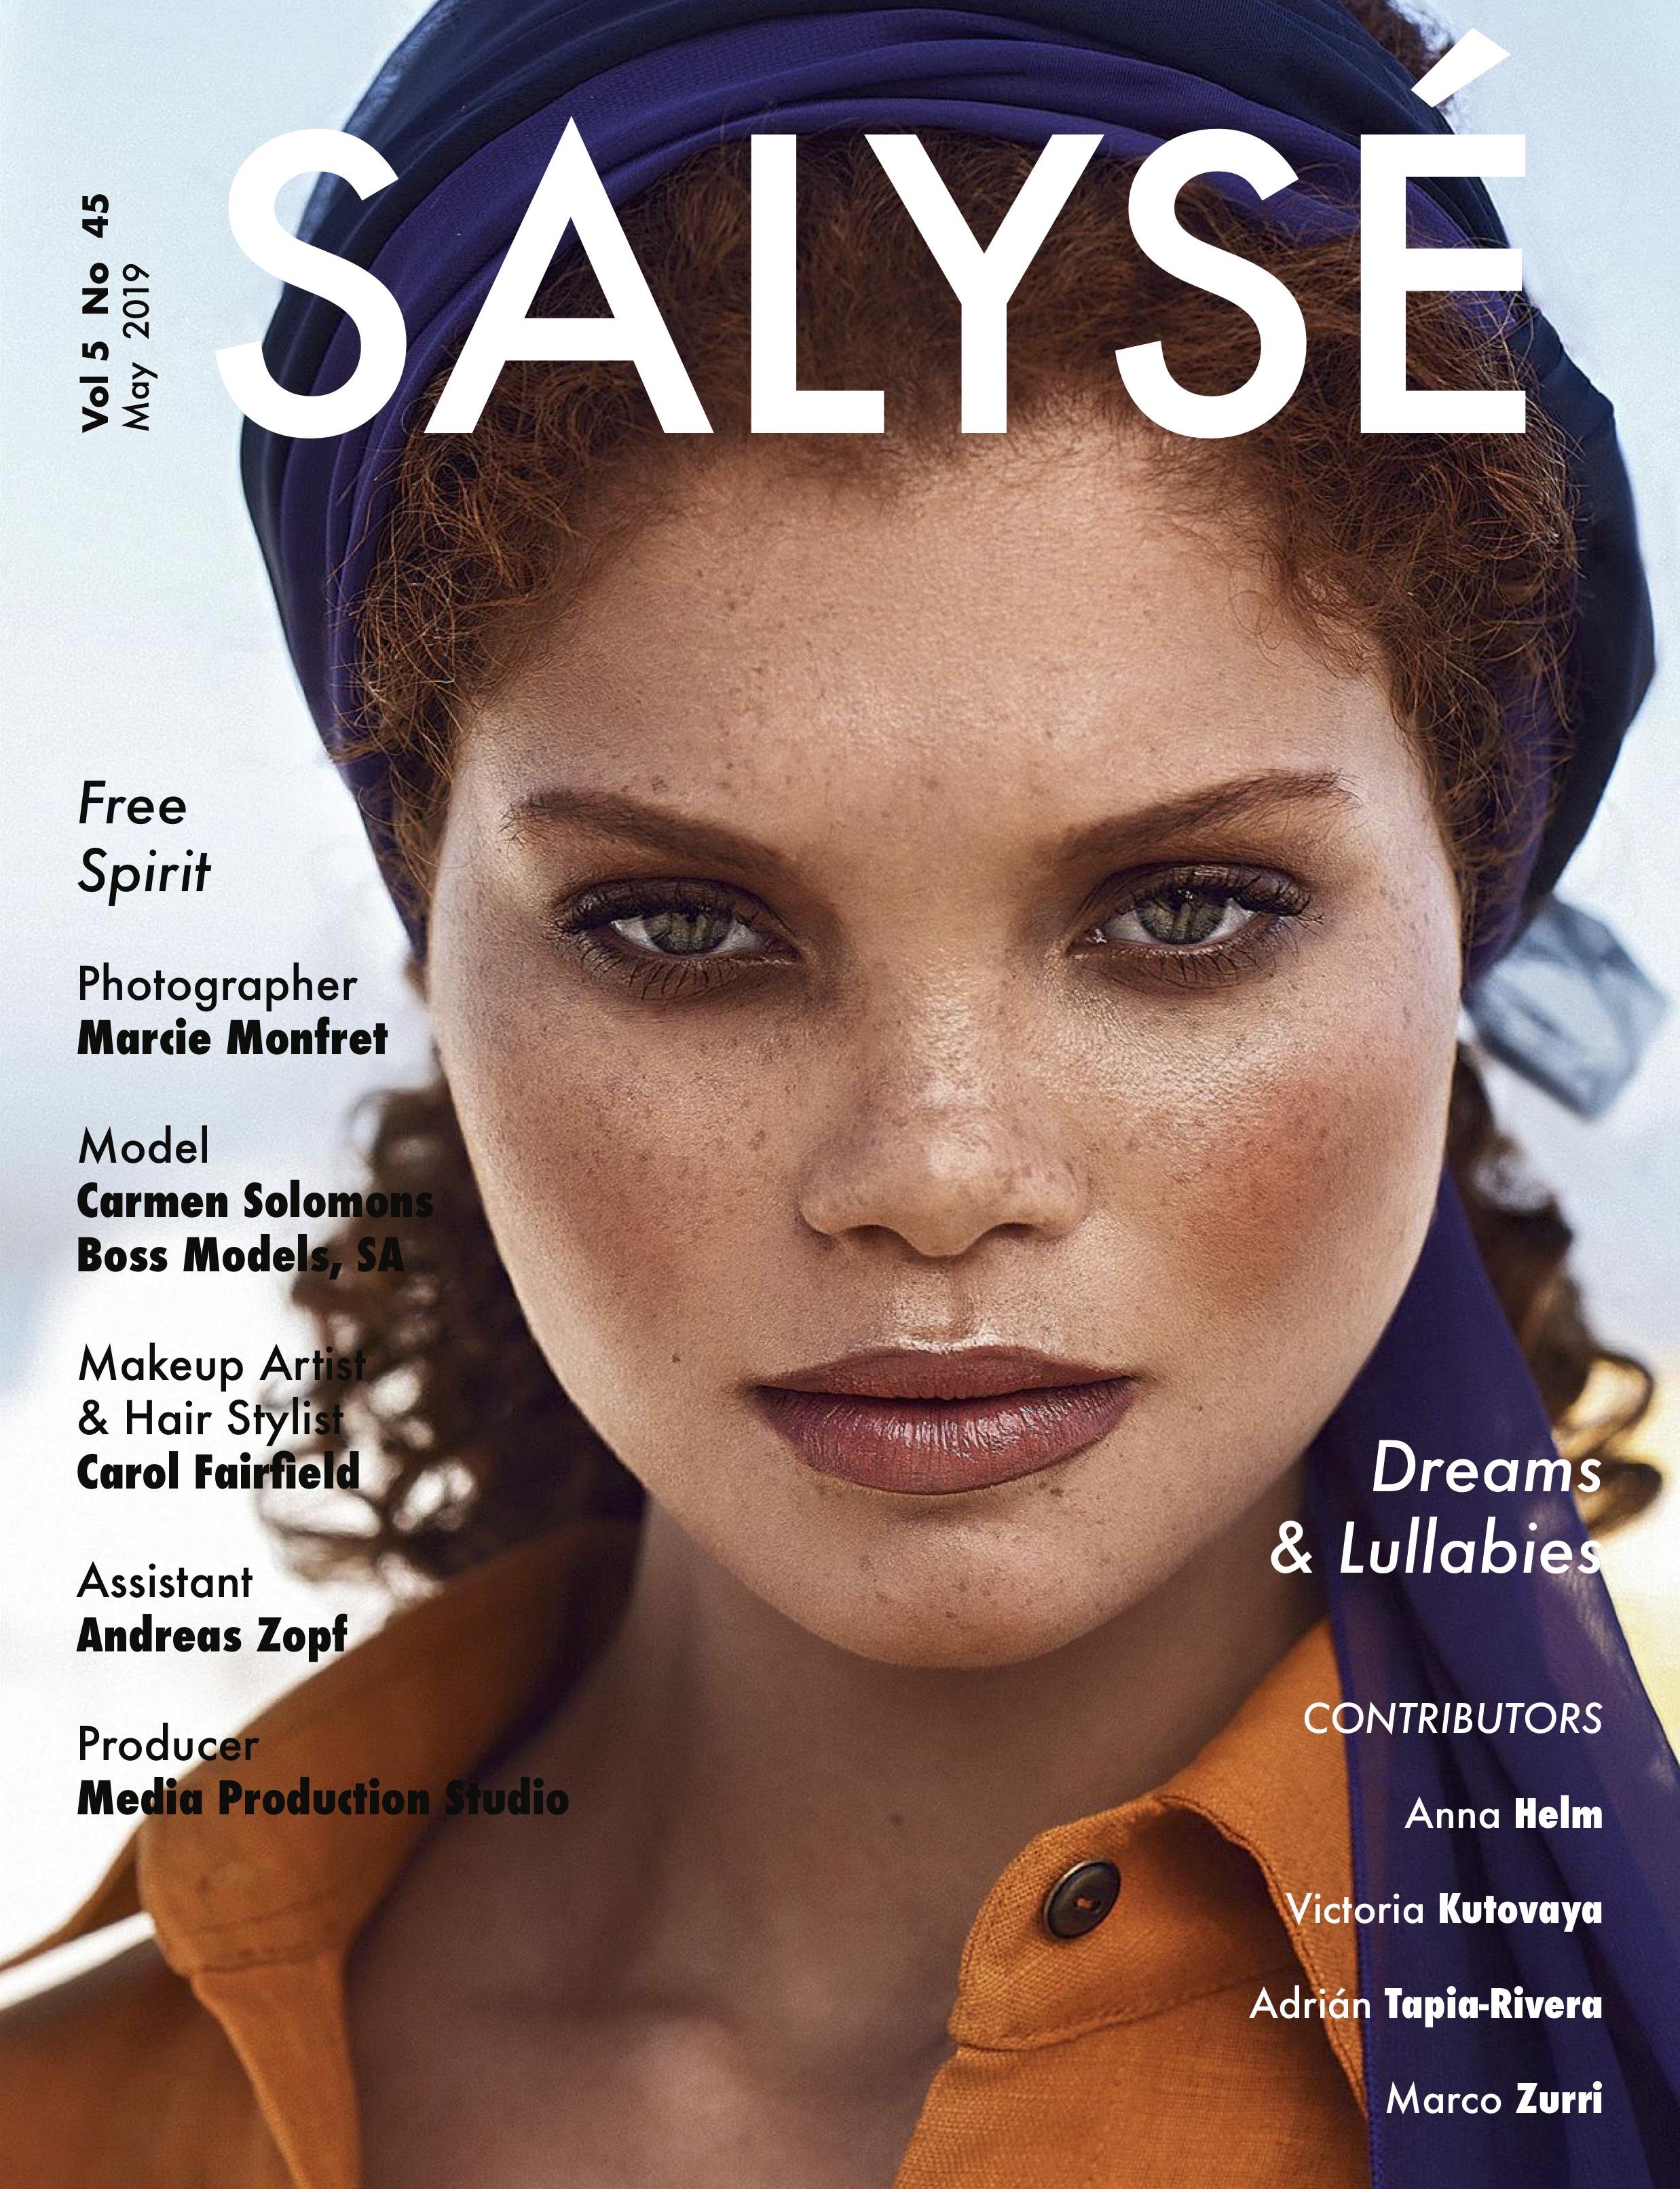 SALYSE Magazine Vol 5 No 45 MAY 2019 - COVER.jpg